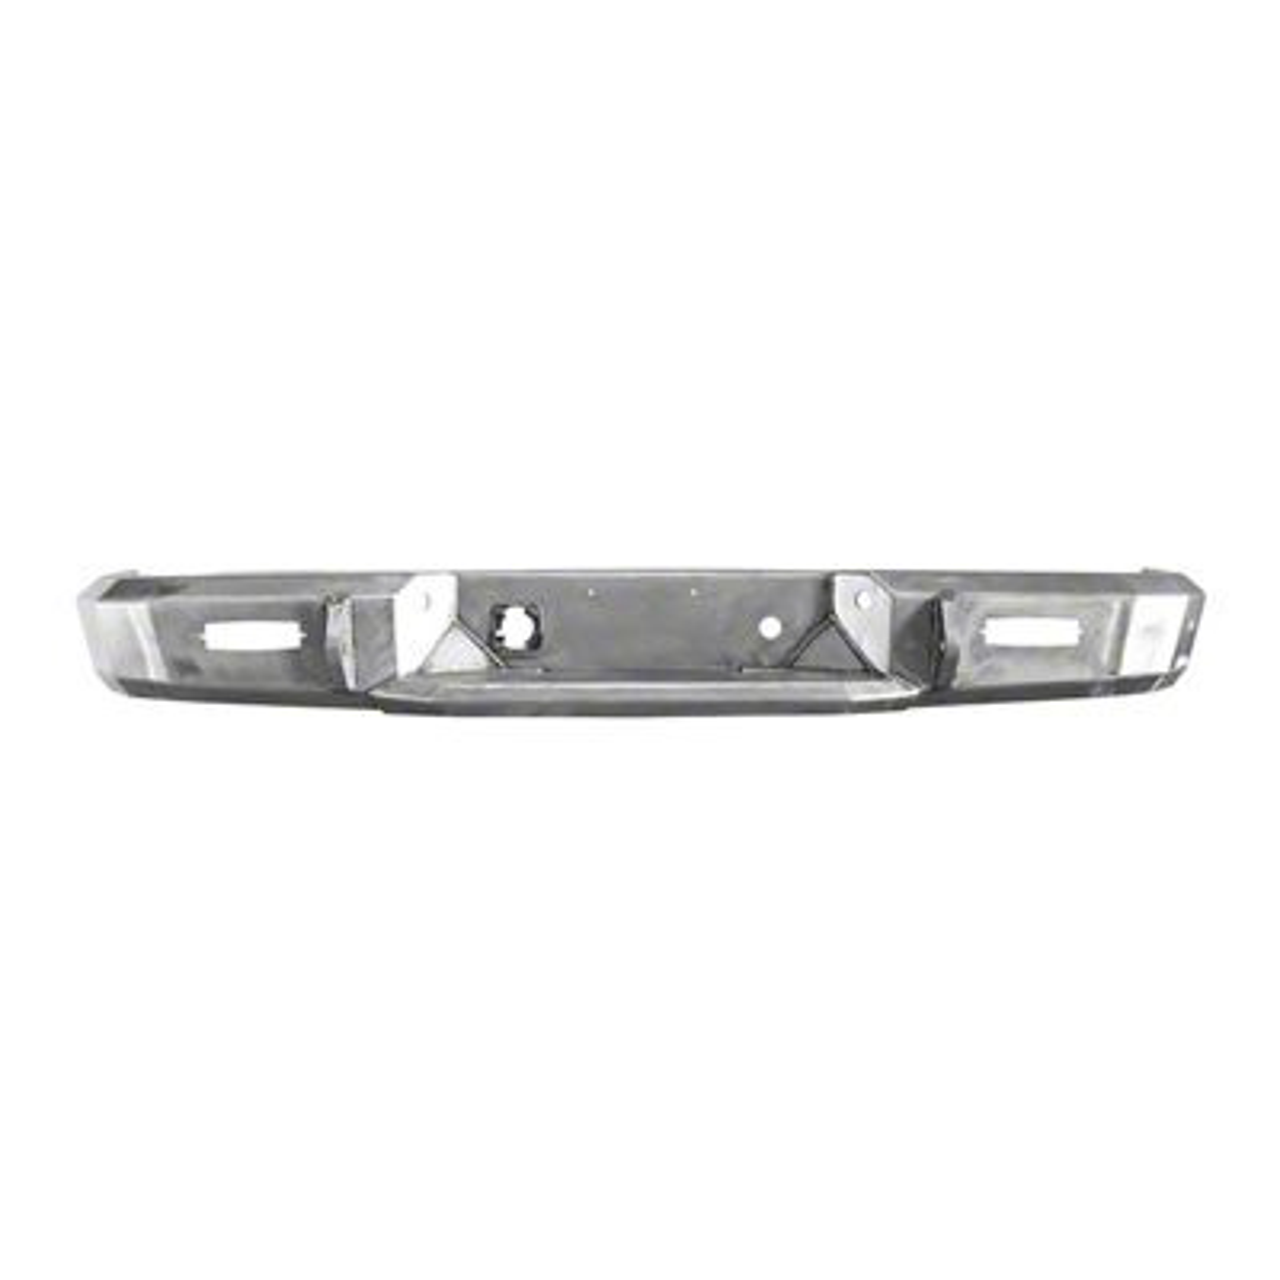 Westin HDX Rear Bumper - Raw (09-18 RAM 1500 w/o Factory Dual Exhaust)